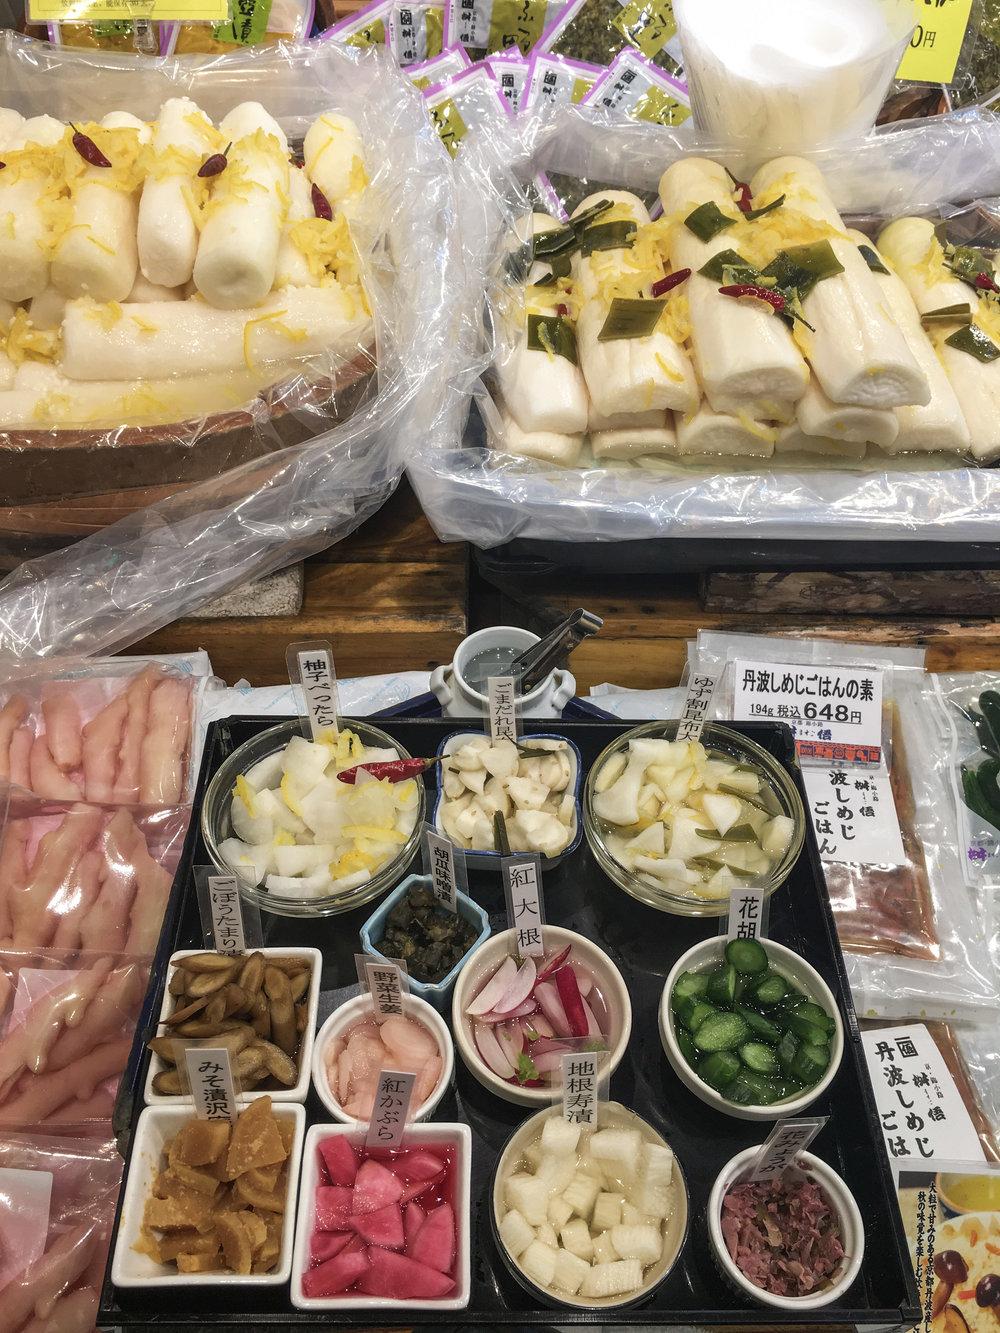 curio.trips.japan.market.jpg